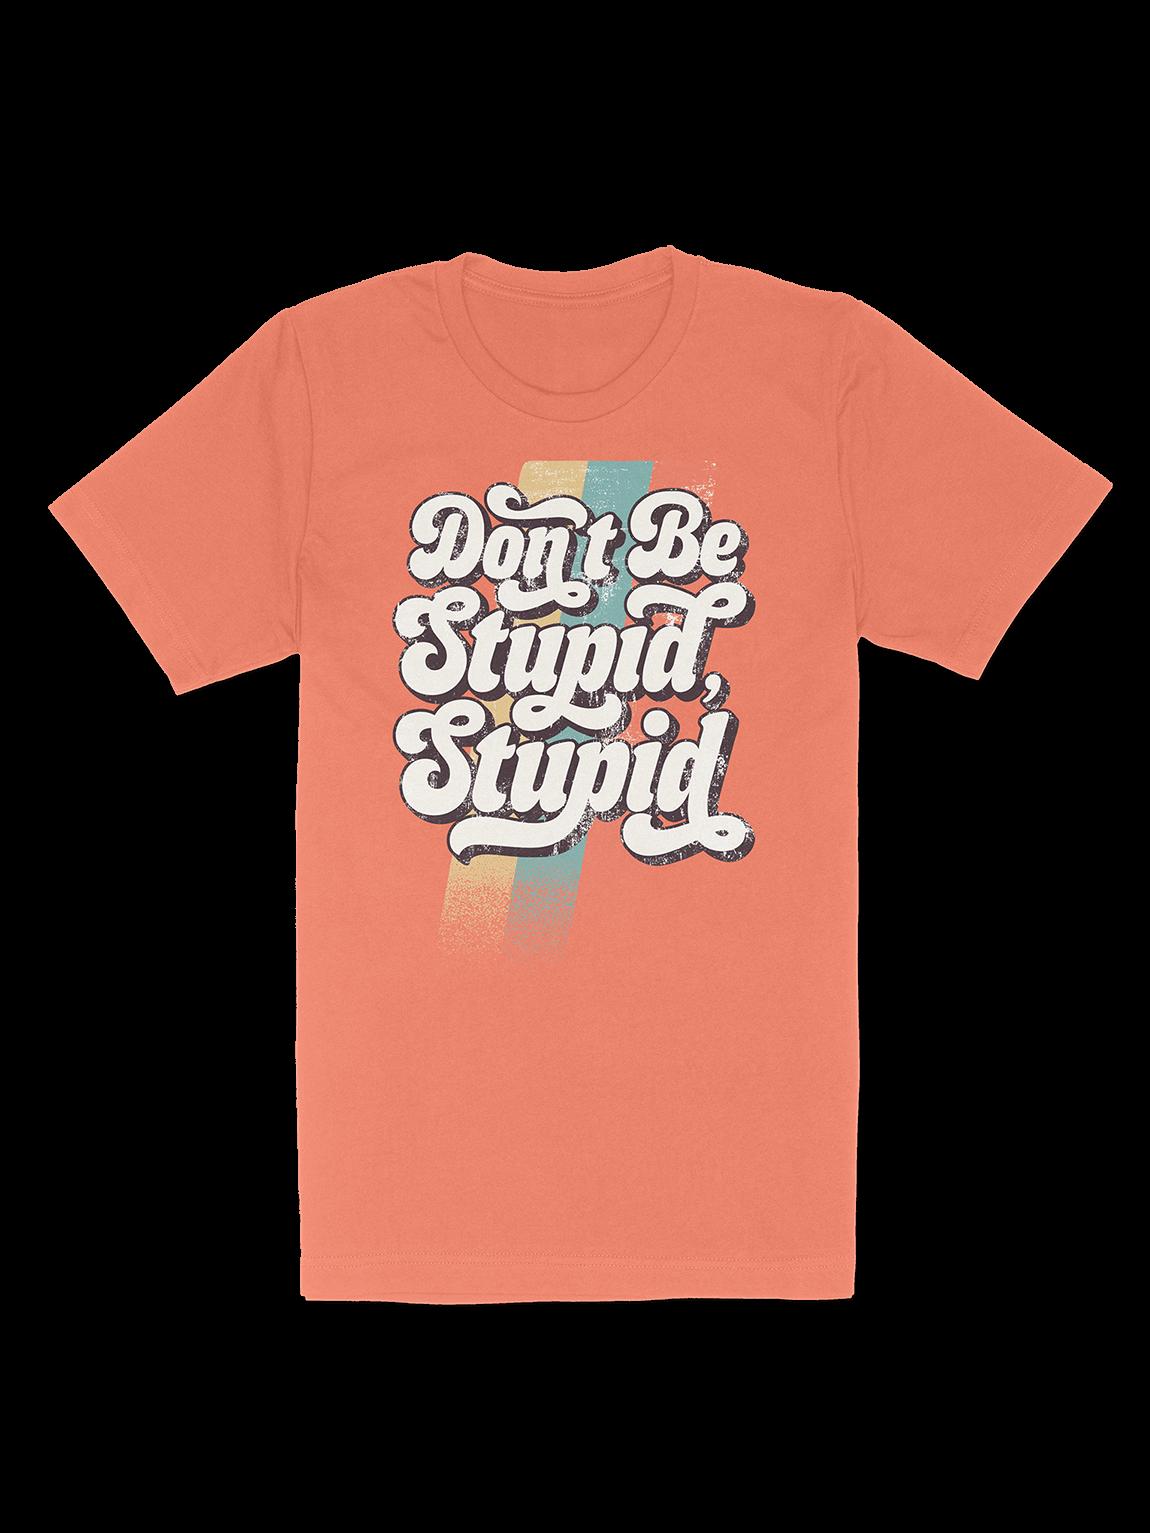 DON'T BE STUPID, STUPID ORANGE VINTAGE T-SHIRT product image (1)